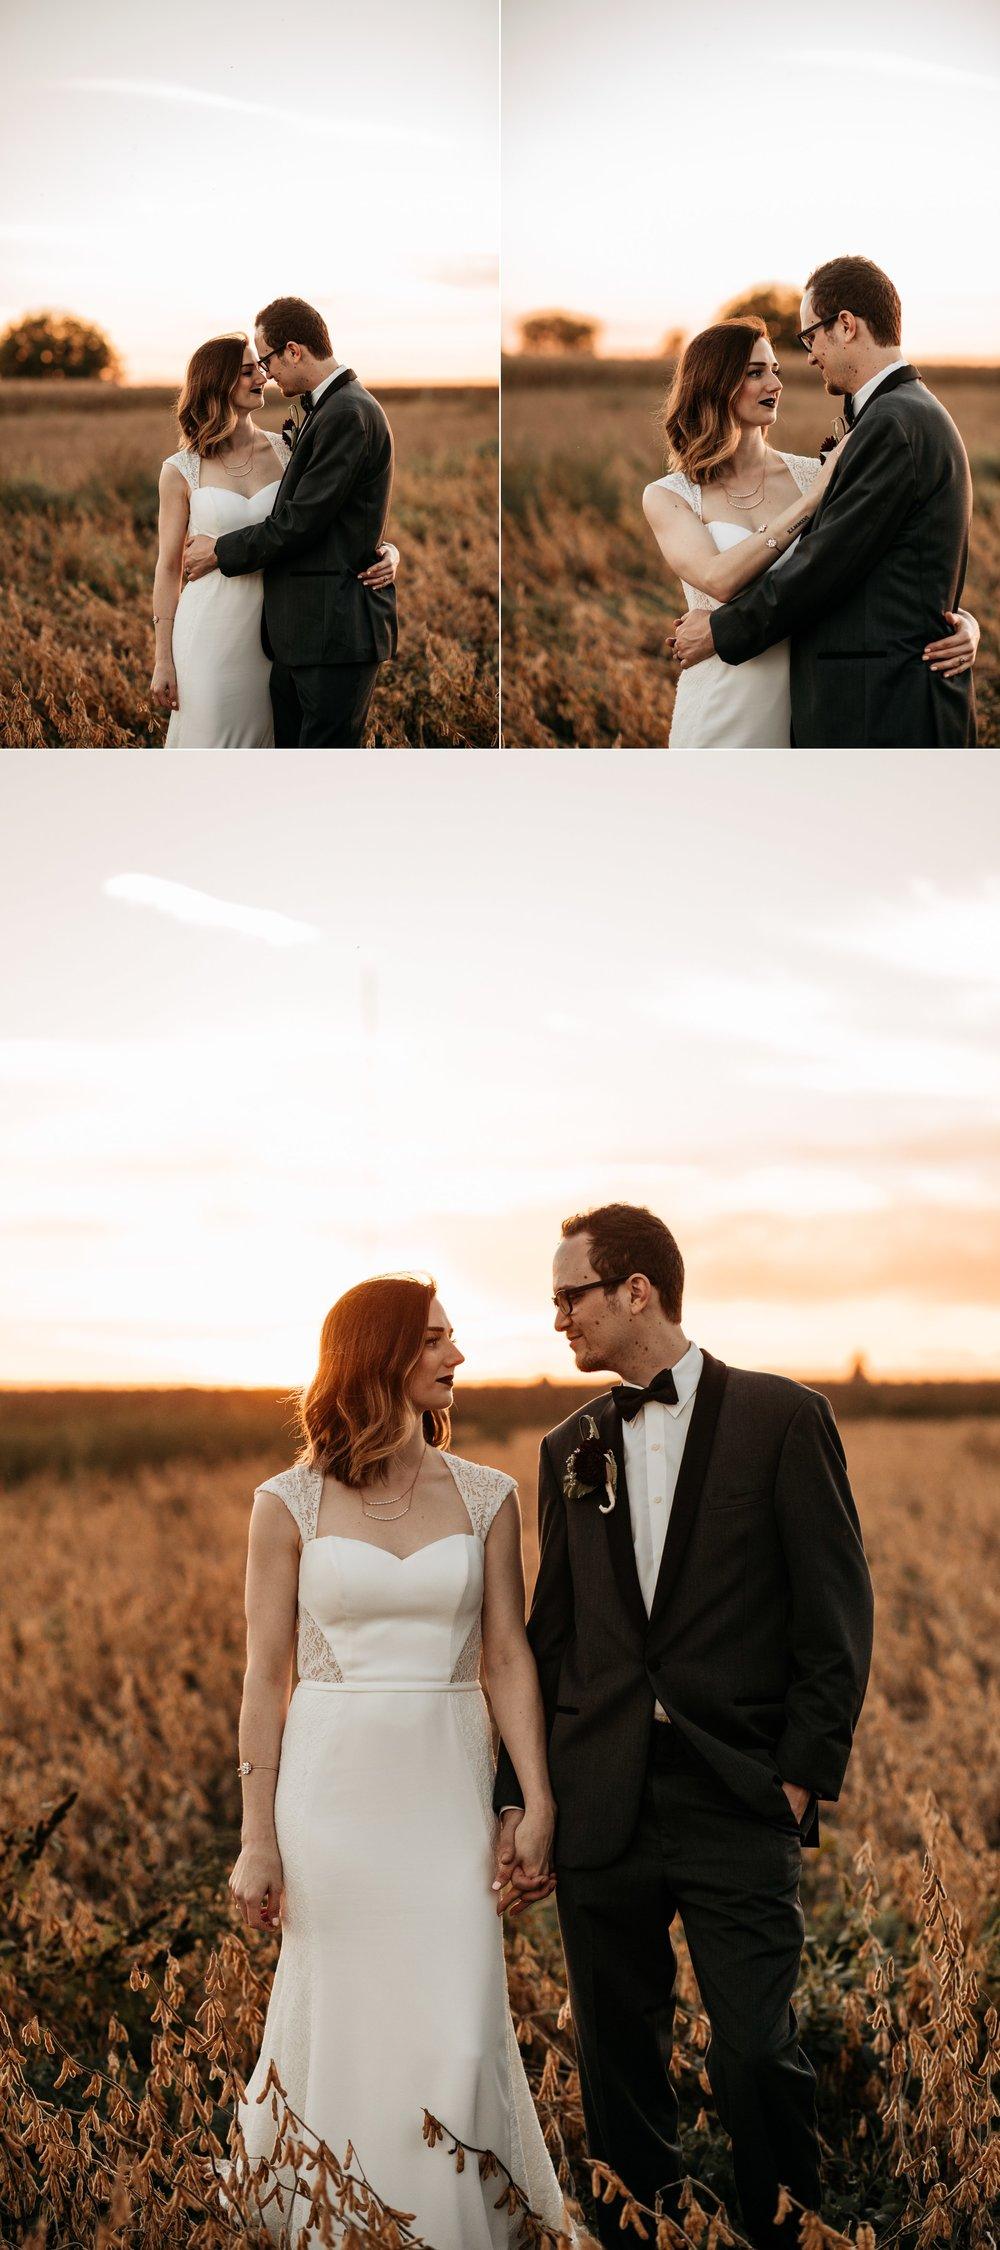 caroline and taylor minneapolis minnesota texas austin dallas houston wedding elopement destination intimate adventurous couple best photographer_0255.jpg